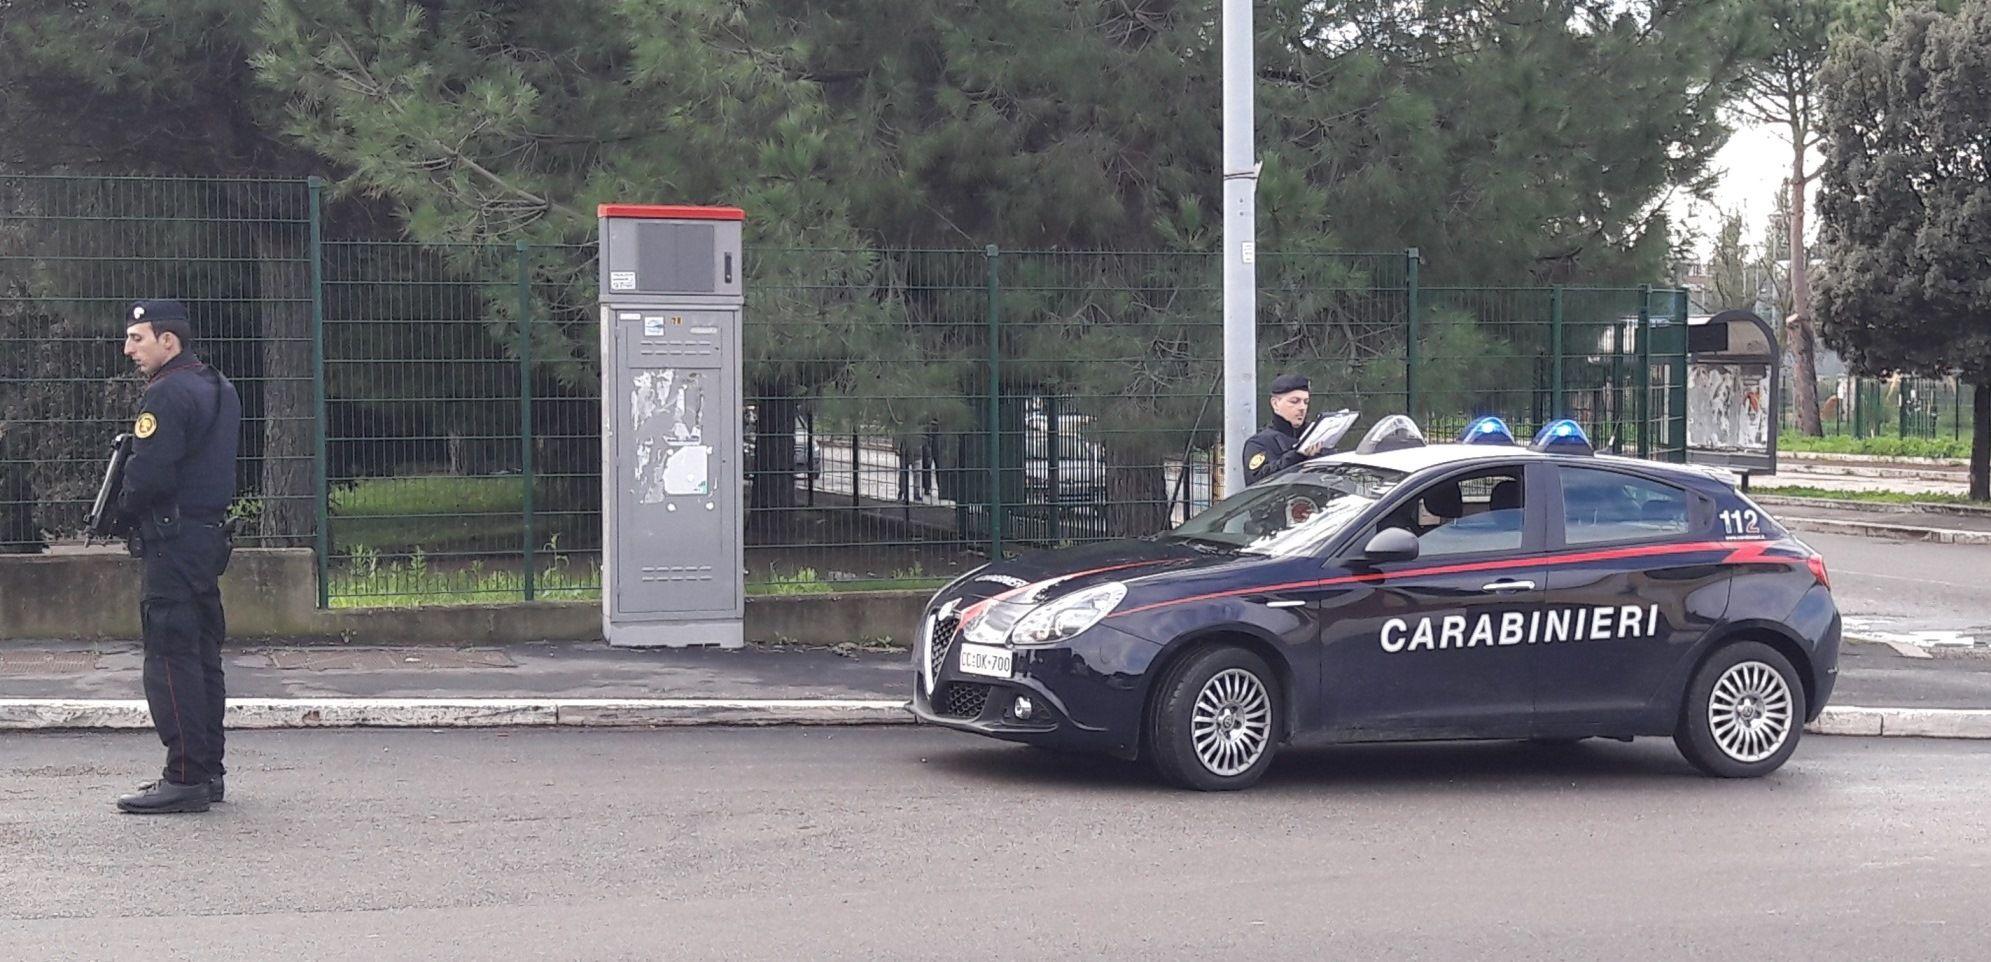 roma controlli carabinieri arresti